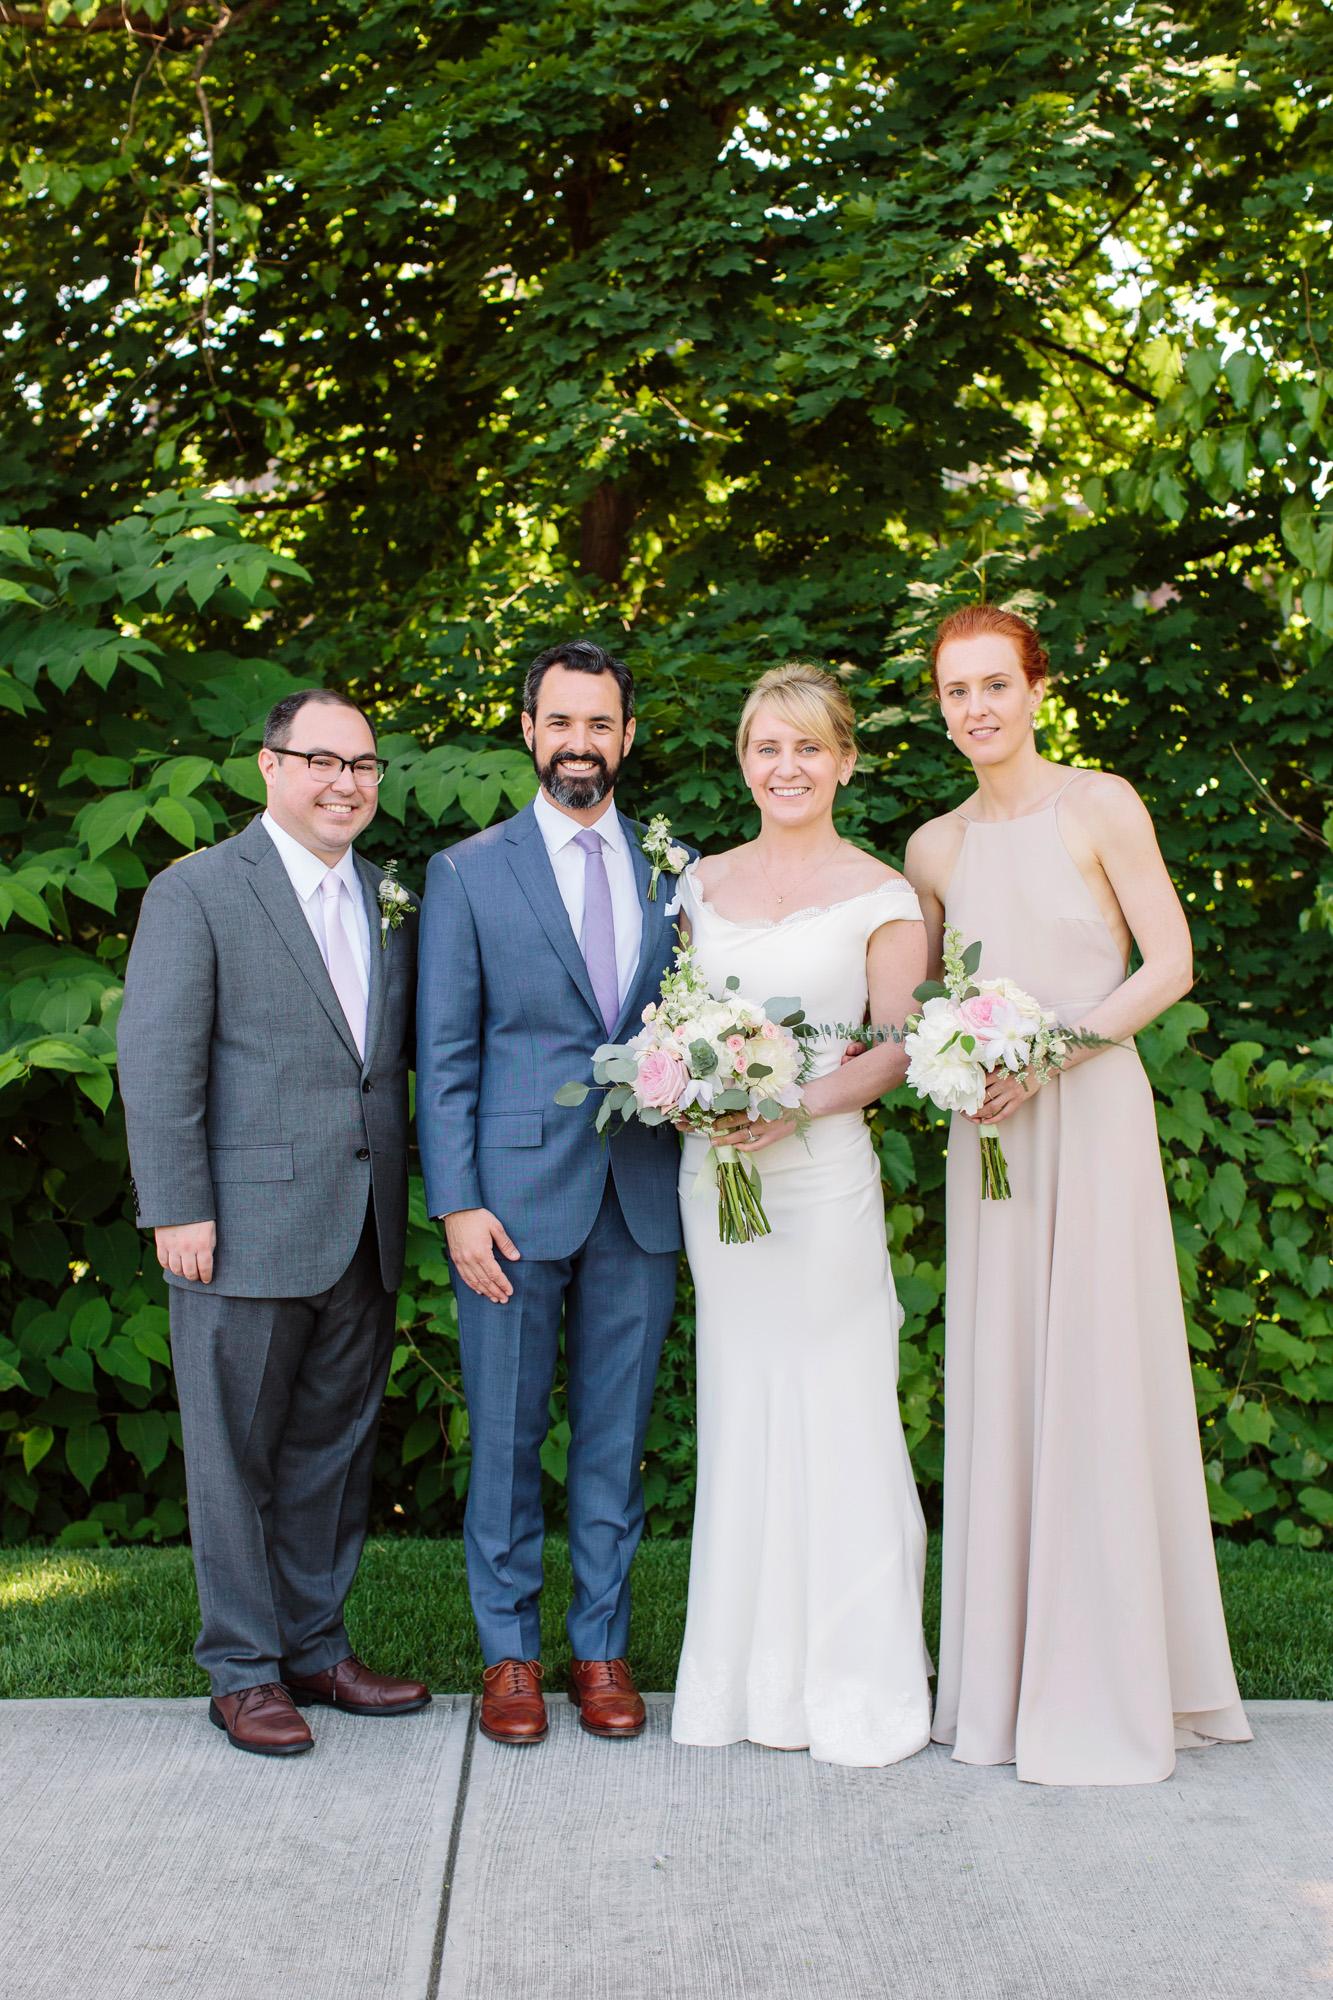 34_Rowan_Brian_The_Roundhouse_Wedding_Beacon_NY_Tanya_Salazar_Photography_452.jpg